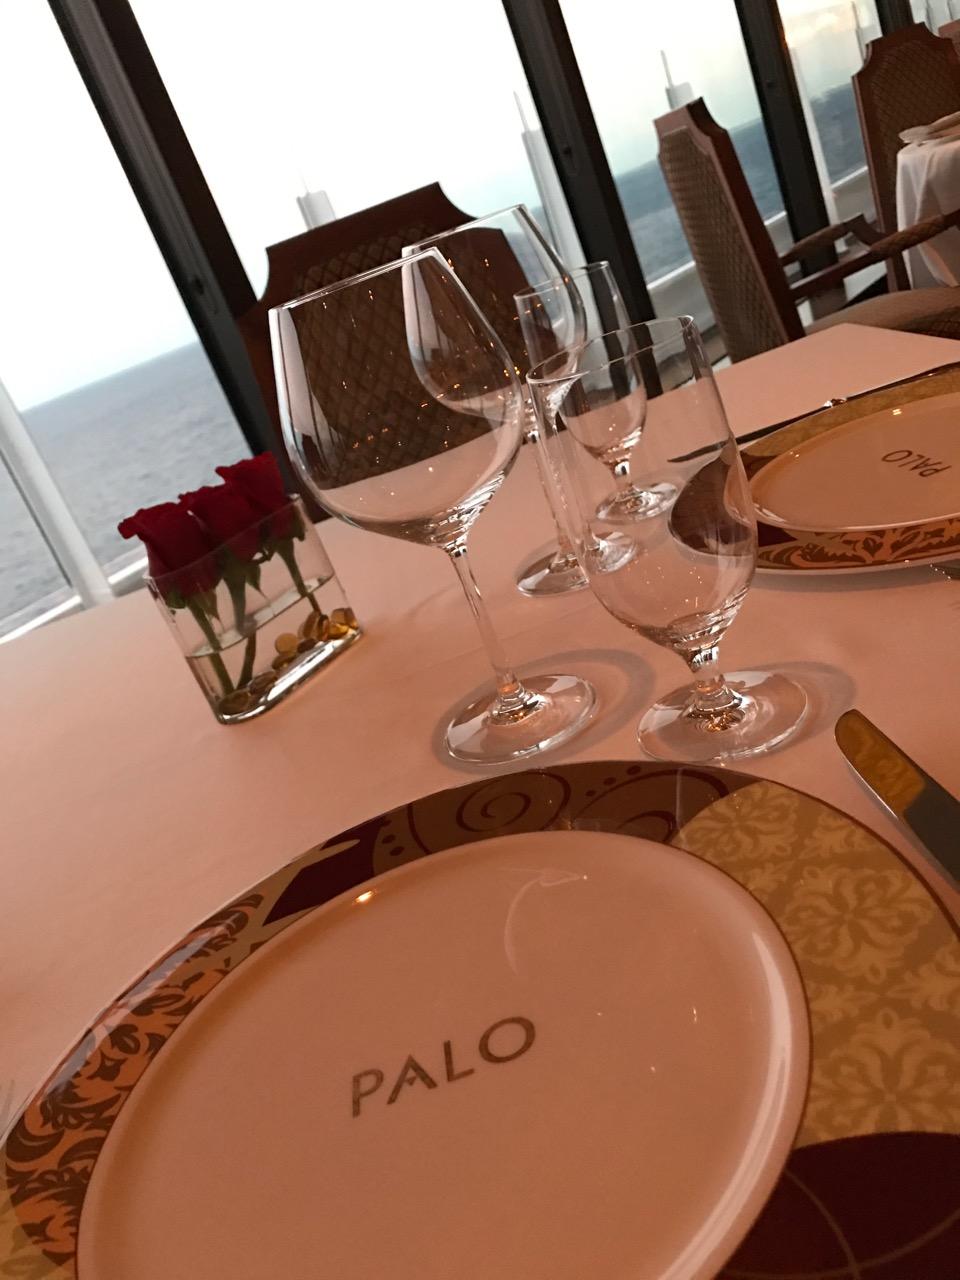 Disney Dream Palo Dinner Place Setting